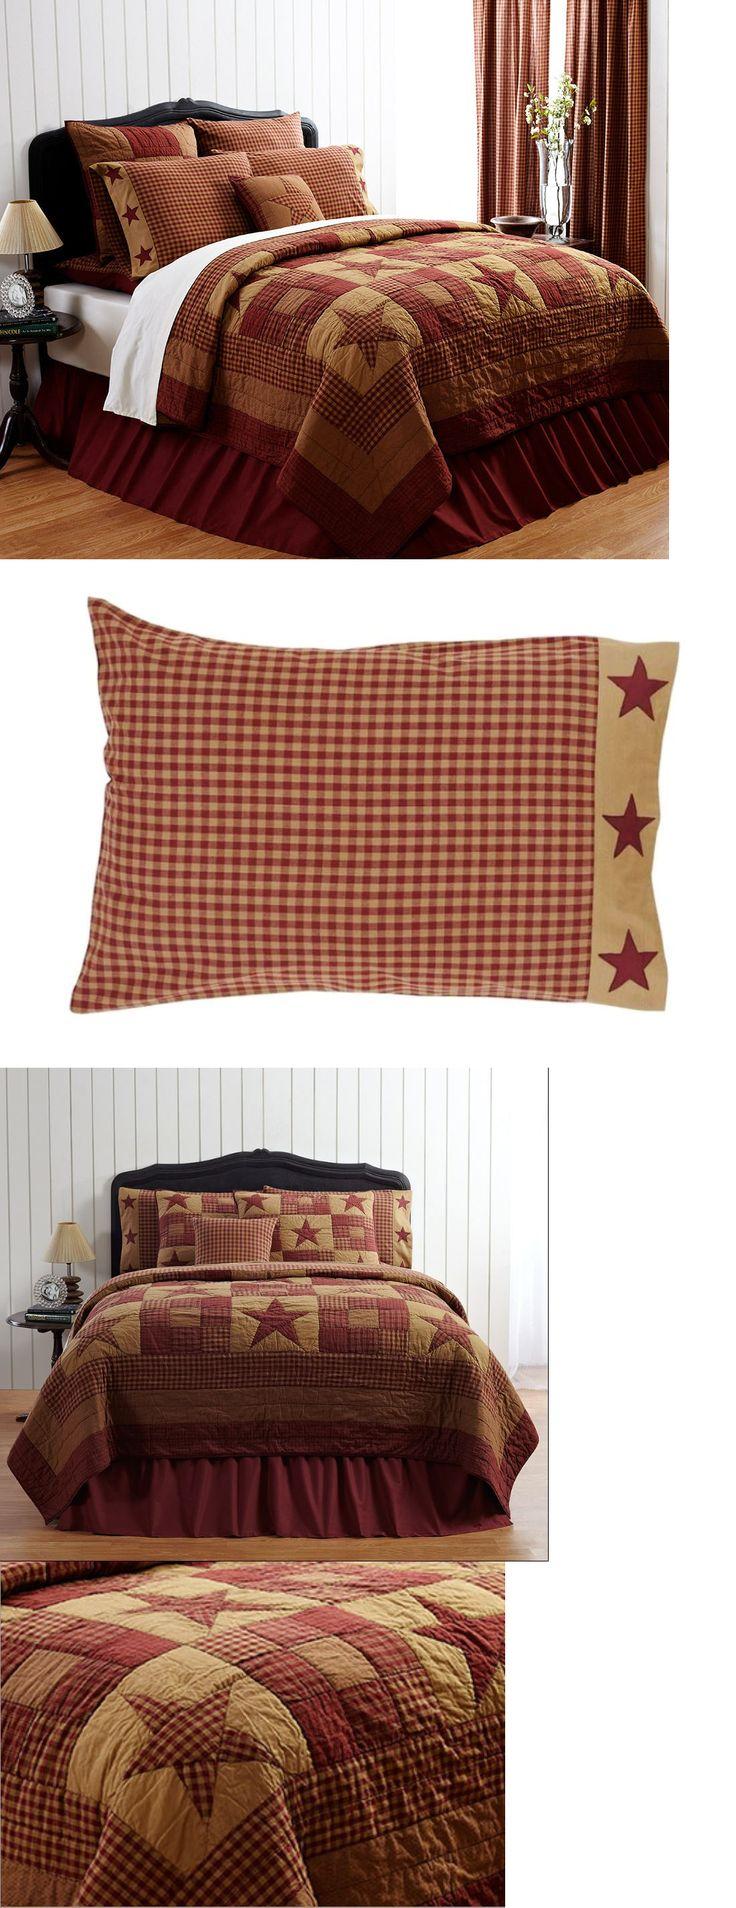 Best 25+ Red bedspread ideas on Pinterest | Red comforter ...